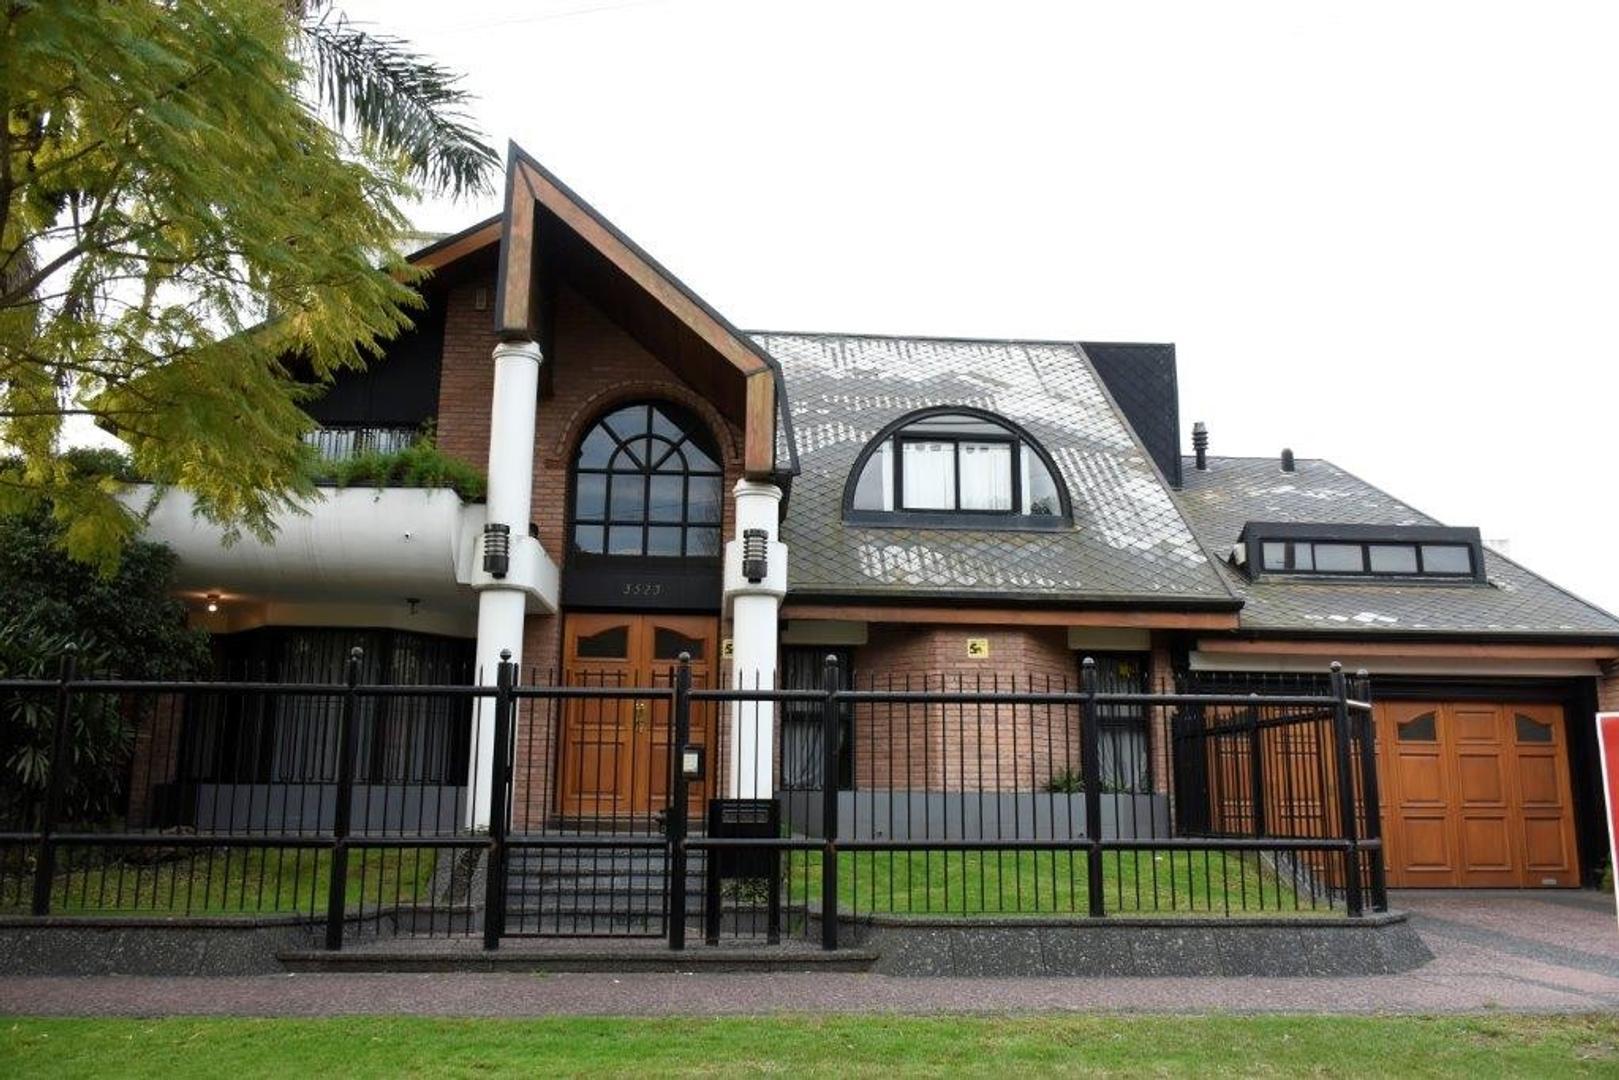 Hermosa casa en Machado Angosto